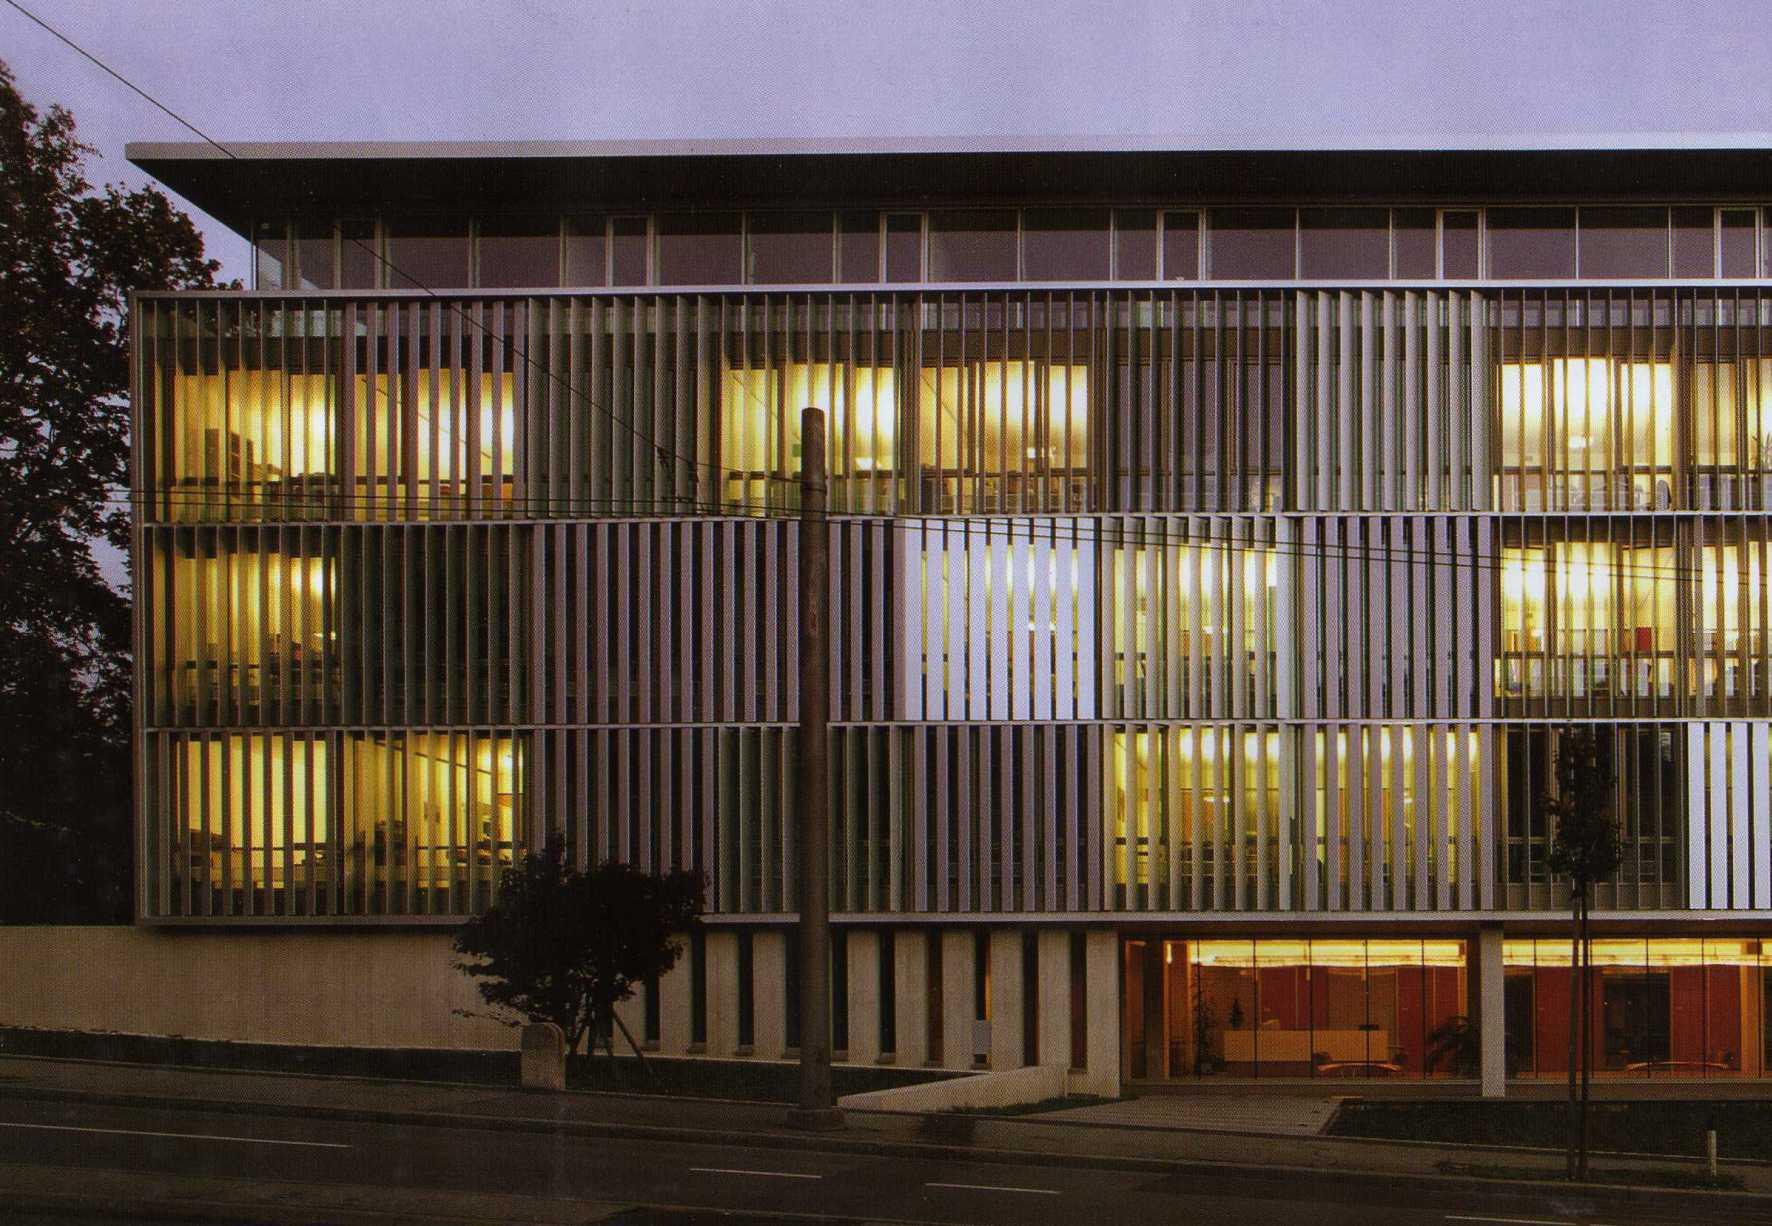 11 edificio de oficinas en berna wikiarquitectura for Edificio oficinas